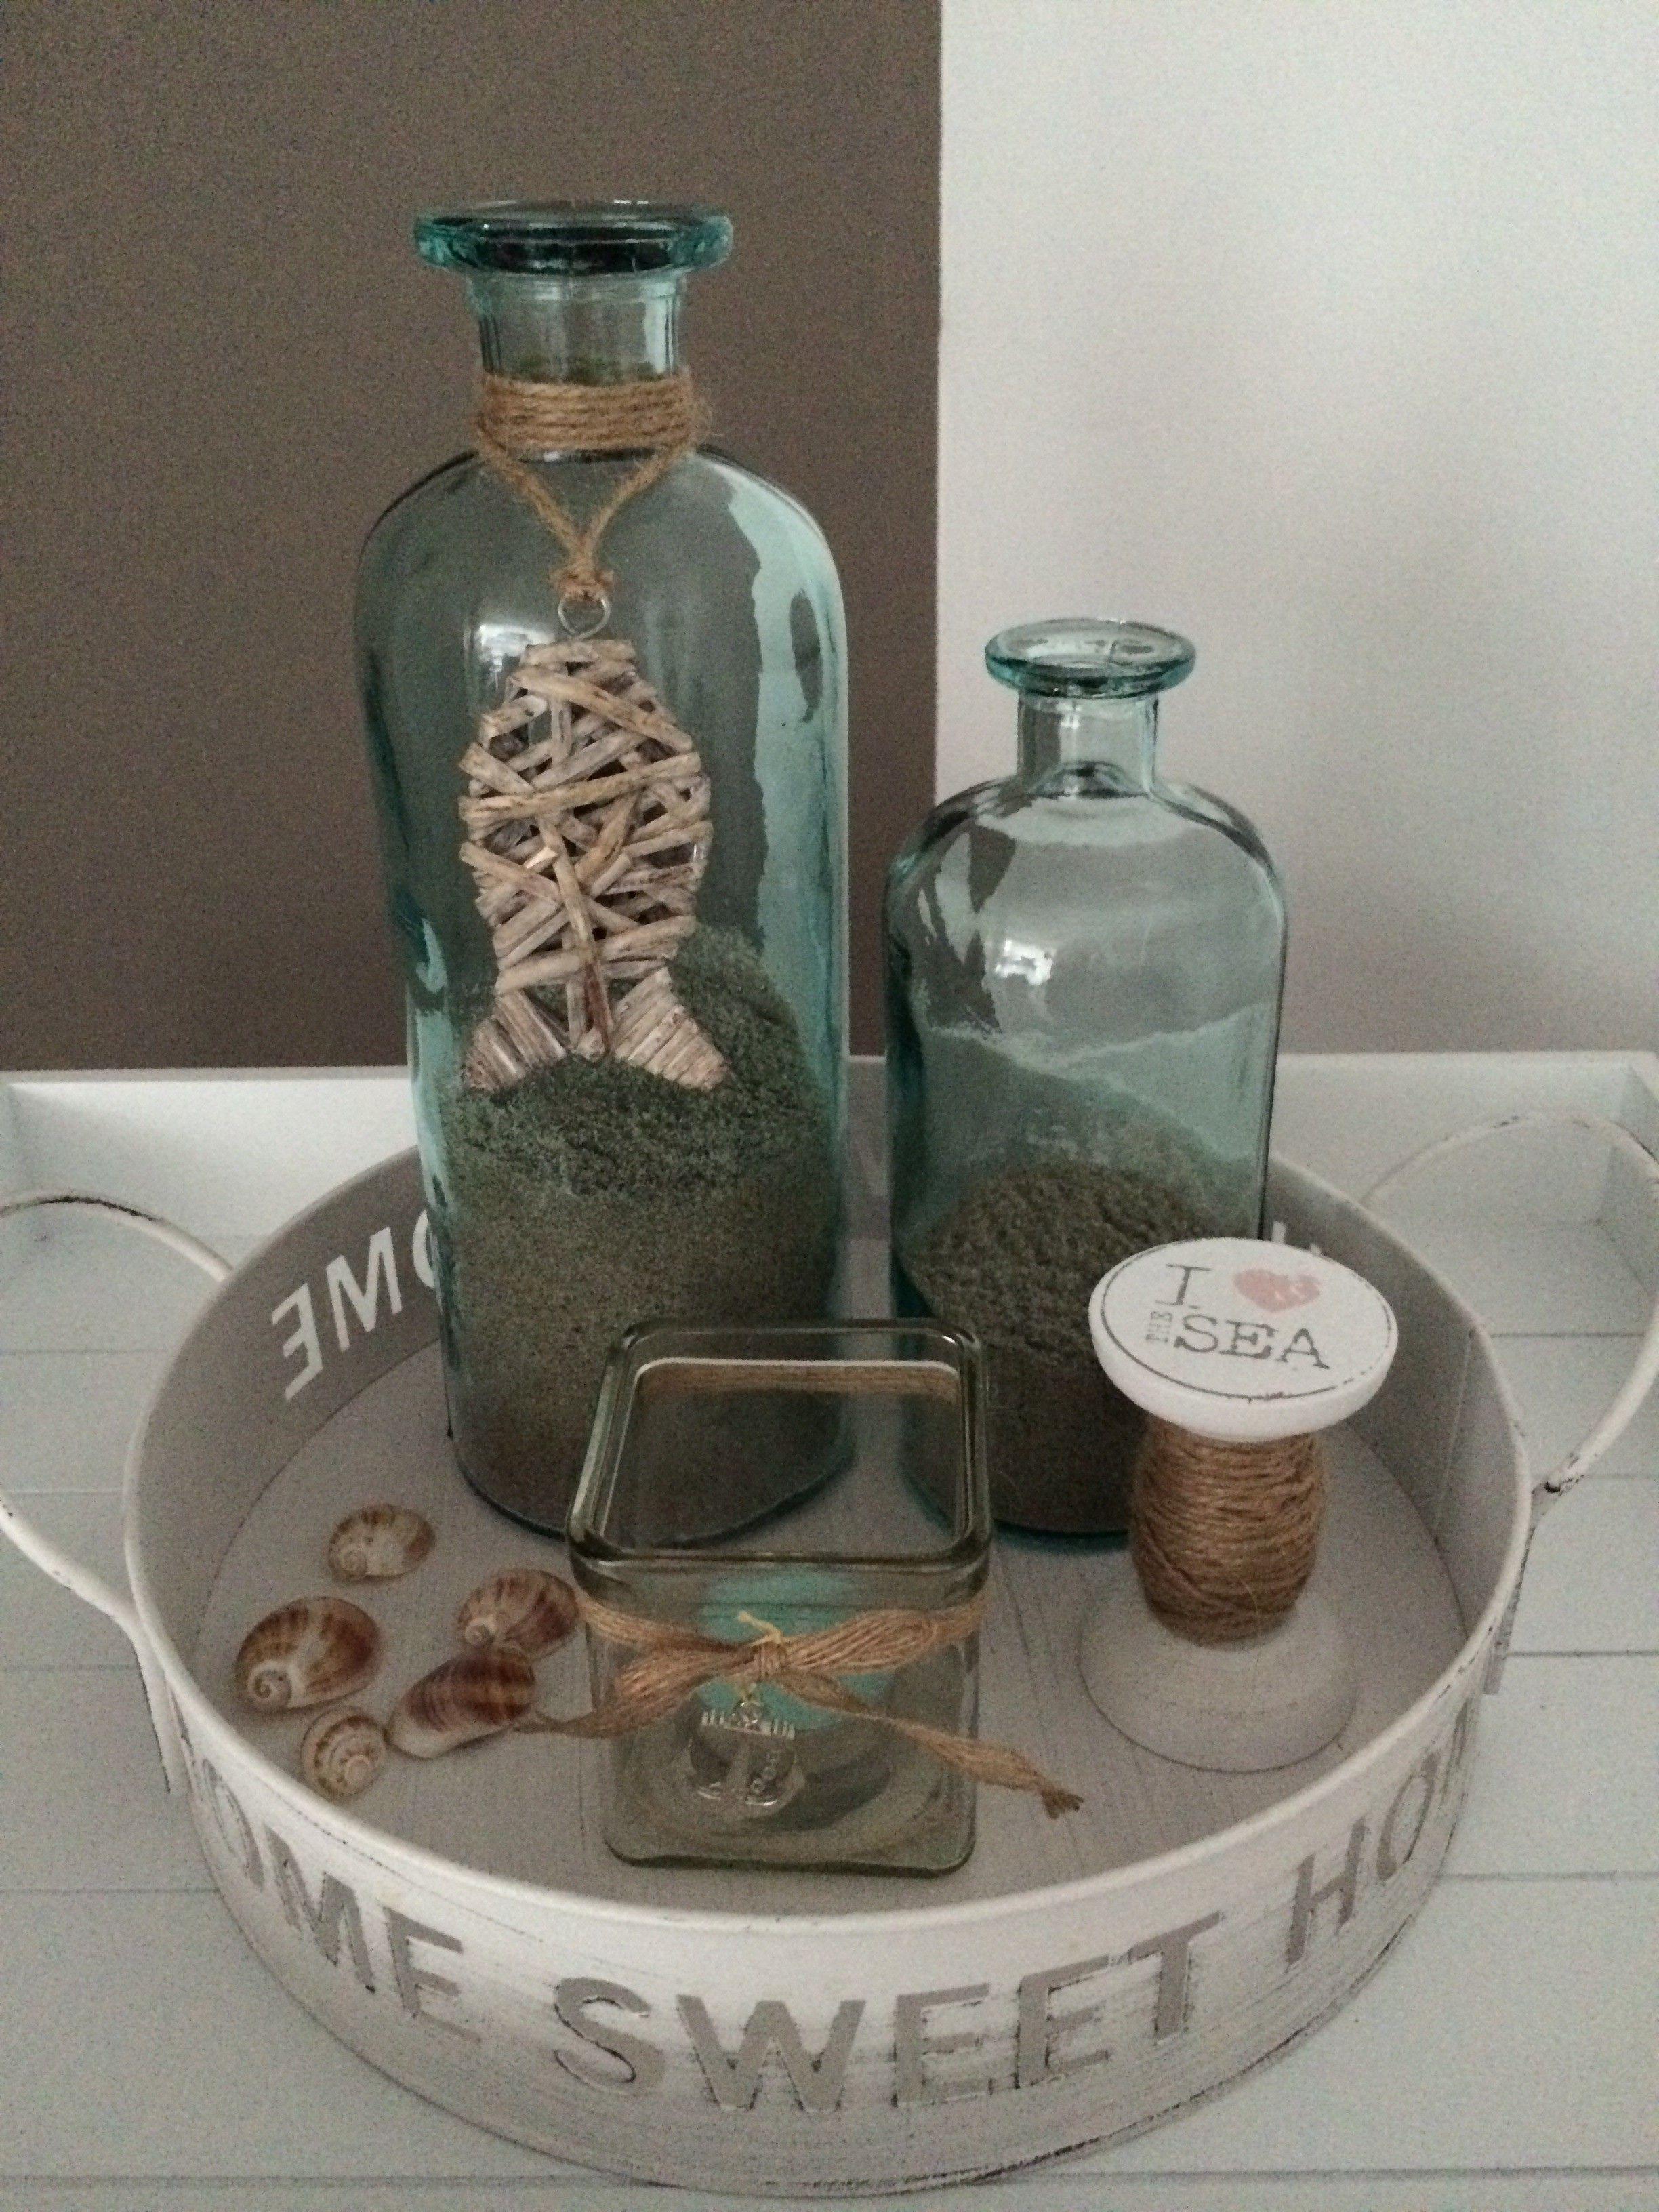 beachstyle schaal via action en xenos | diy crafts and more, Badezimmer ideen